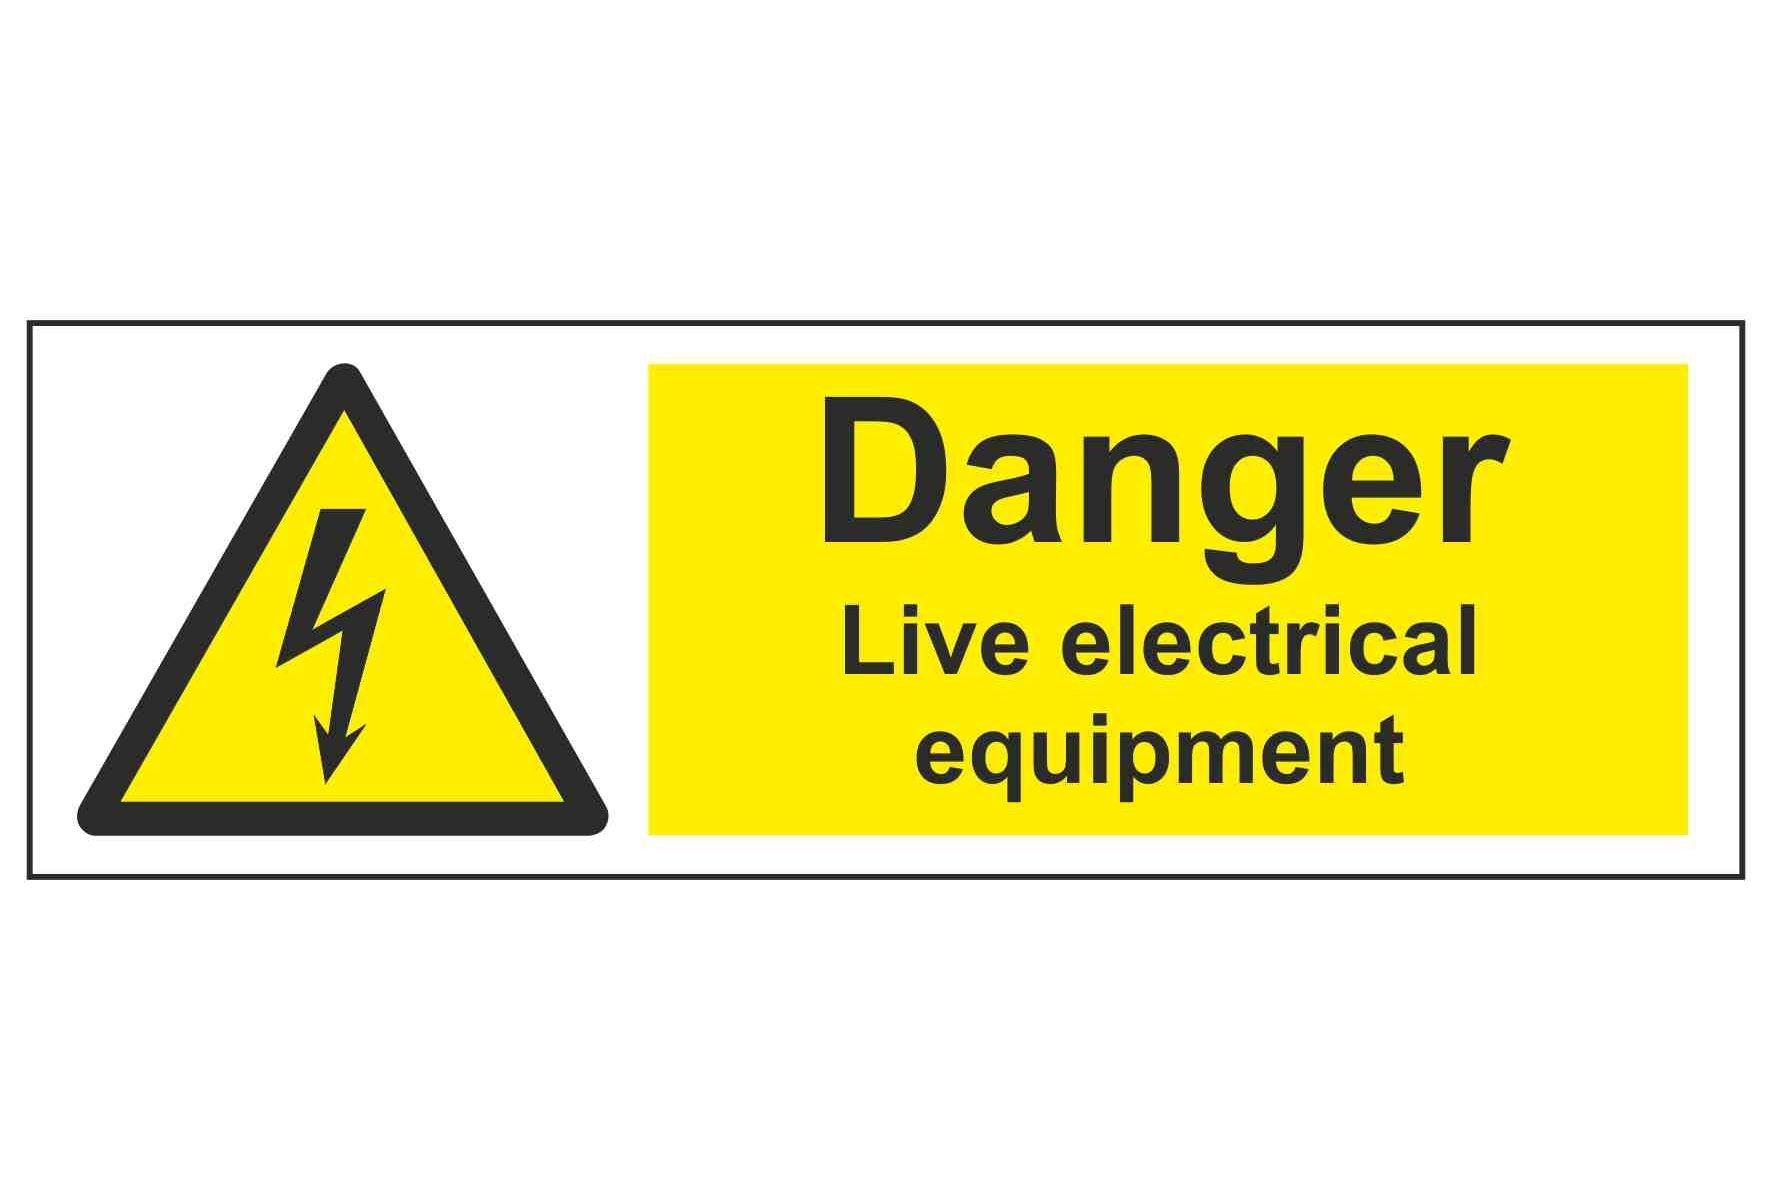 Danger Live electrical equipment